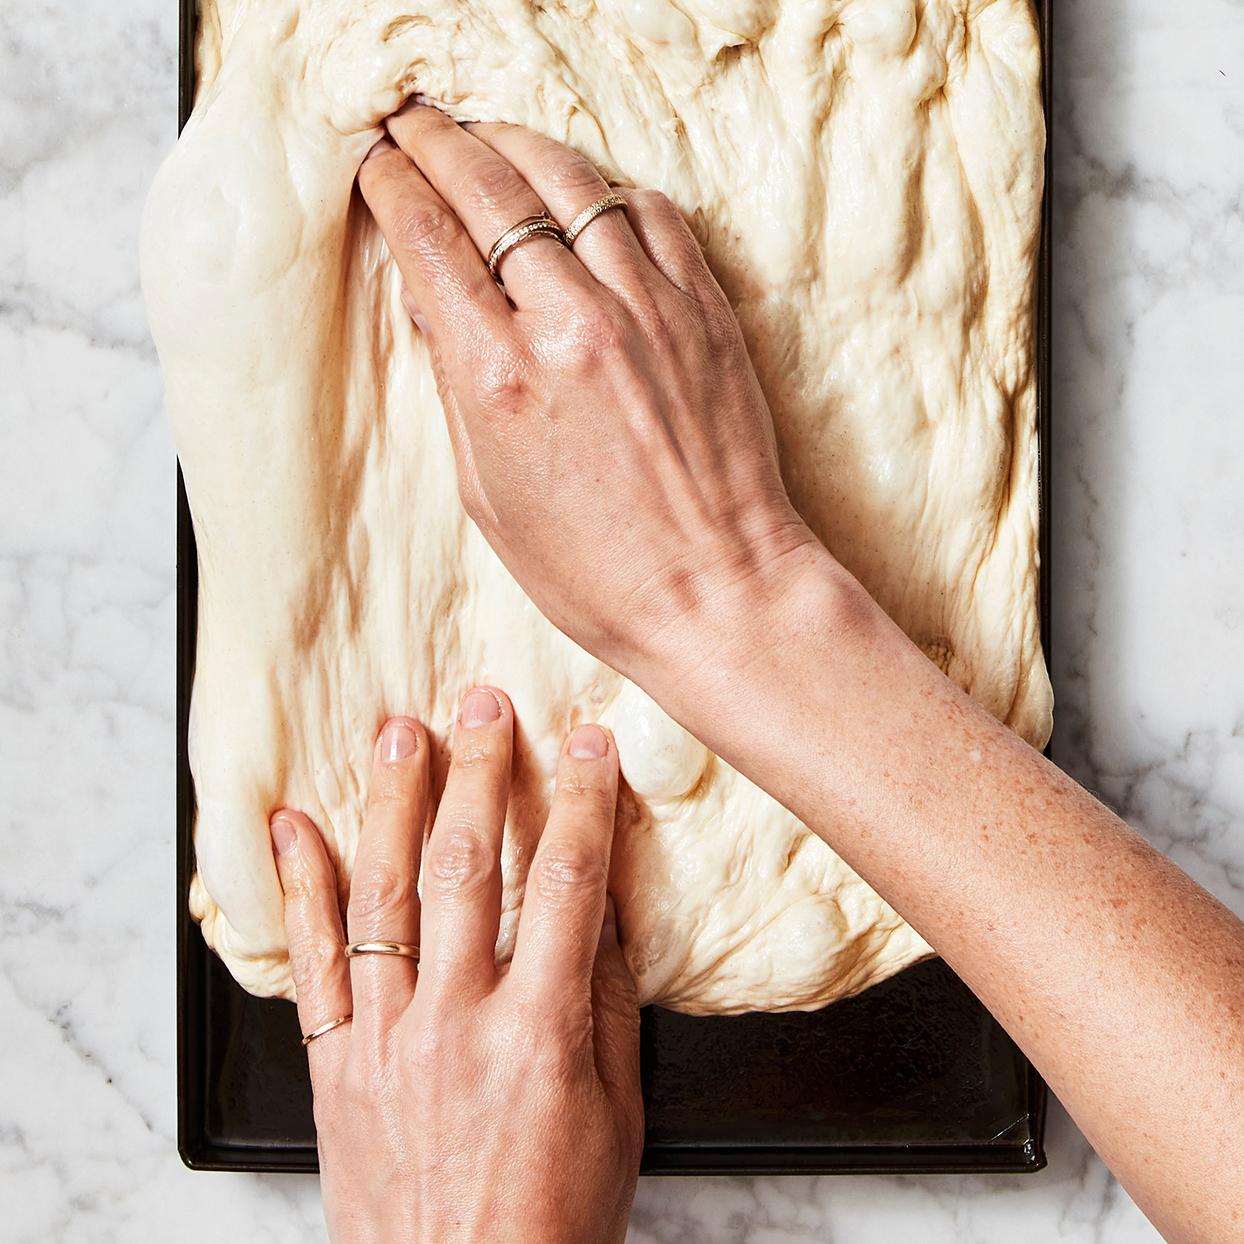 Direct High-Hydration Al Taglio Pizza Dough step 4 stretch fill pan